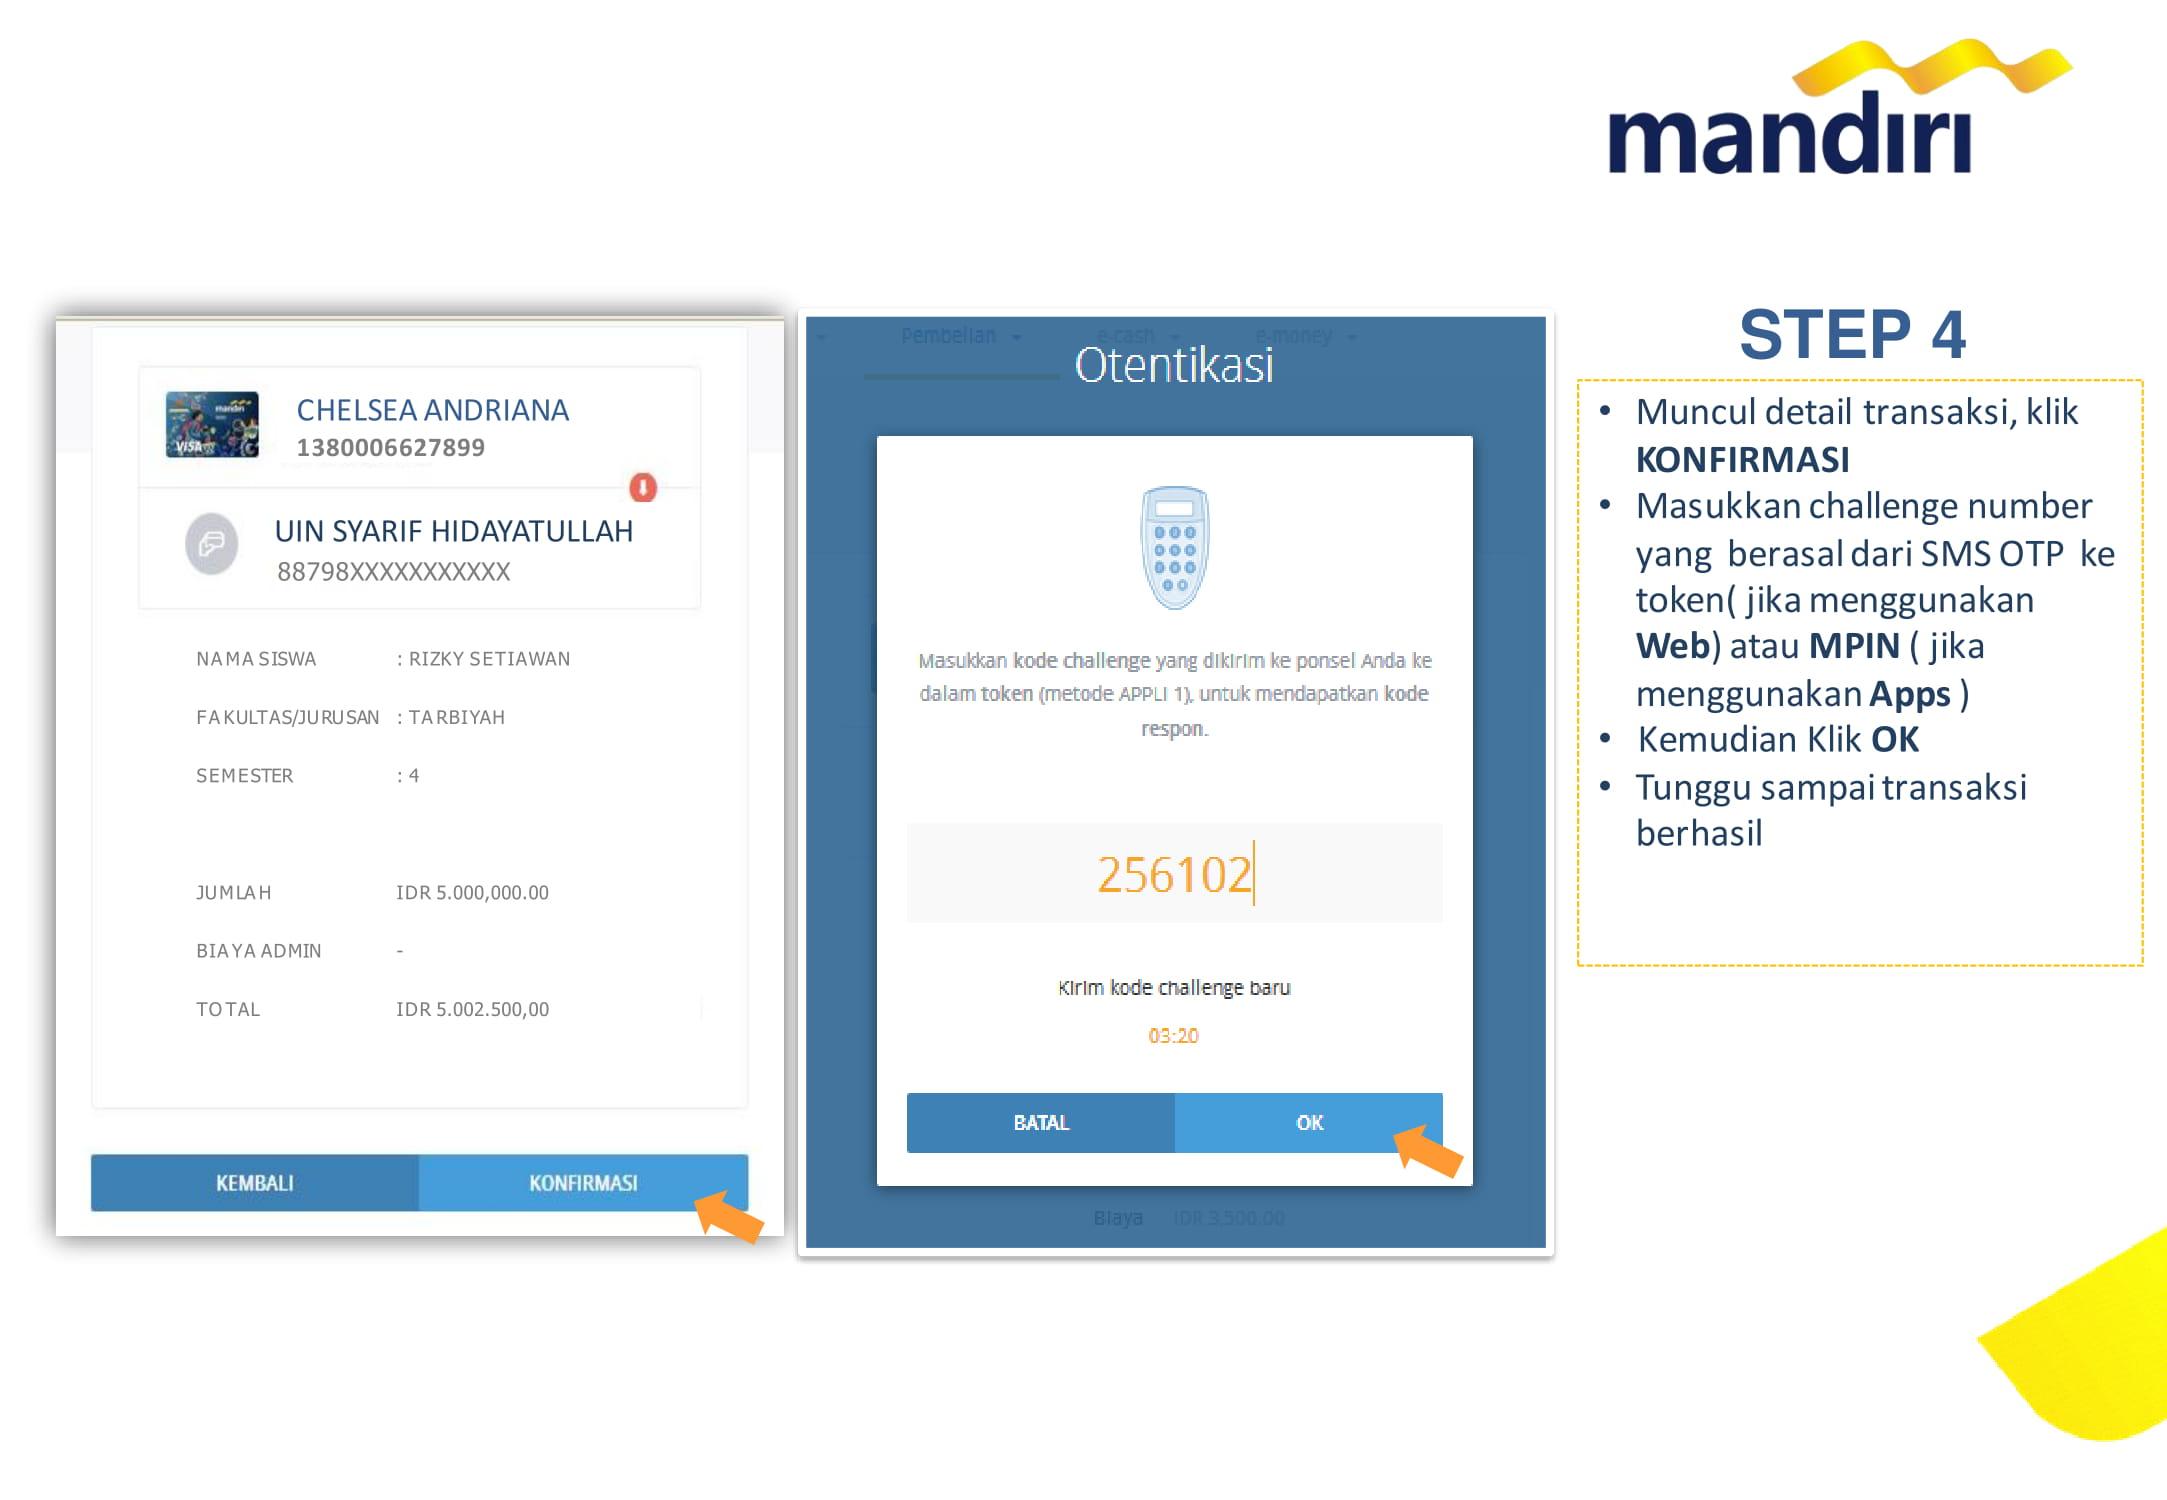 mandiri_ibank_step4